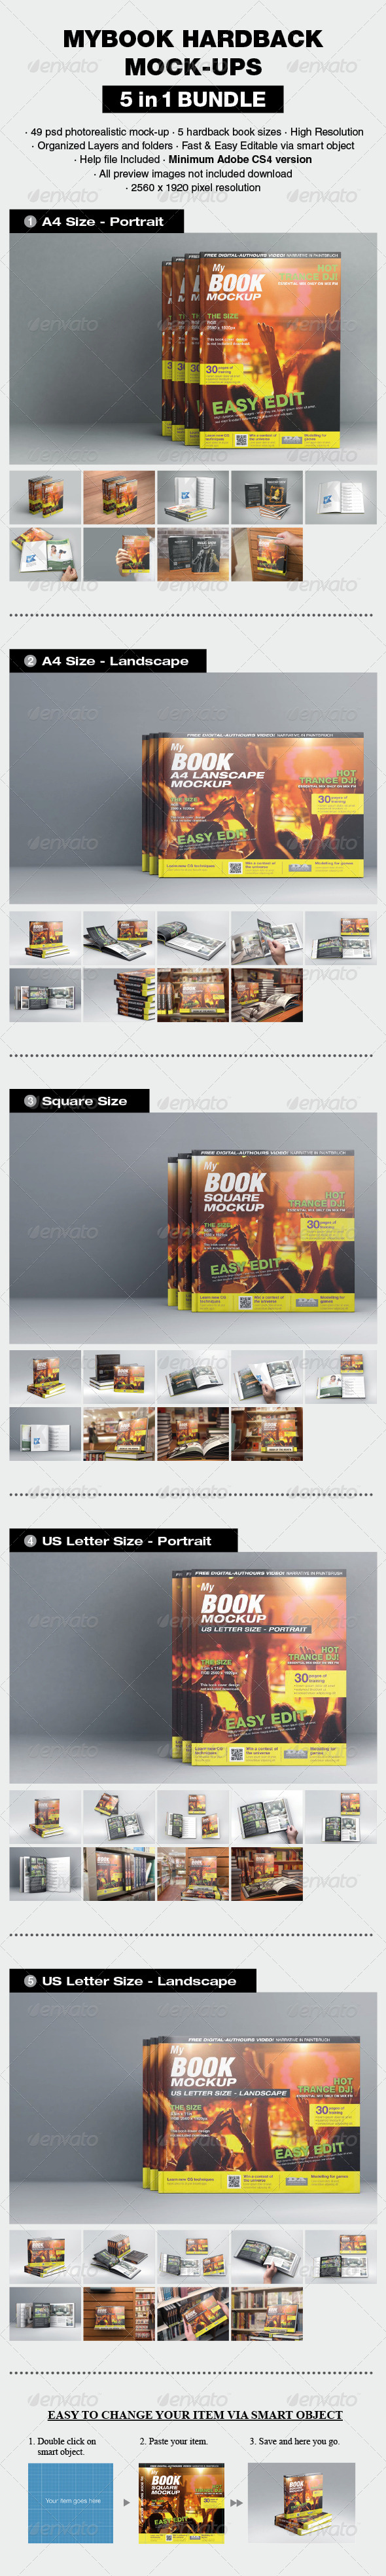 mybook Hardback Bundle